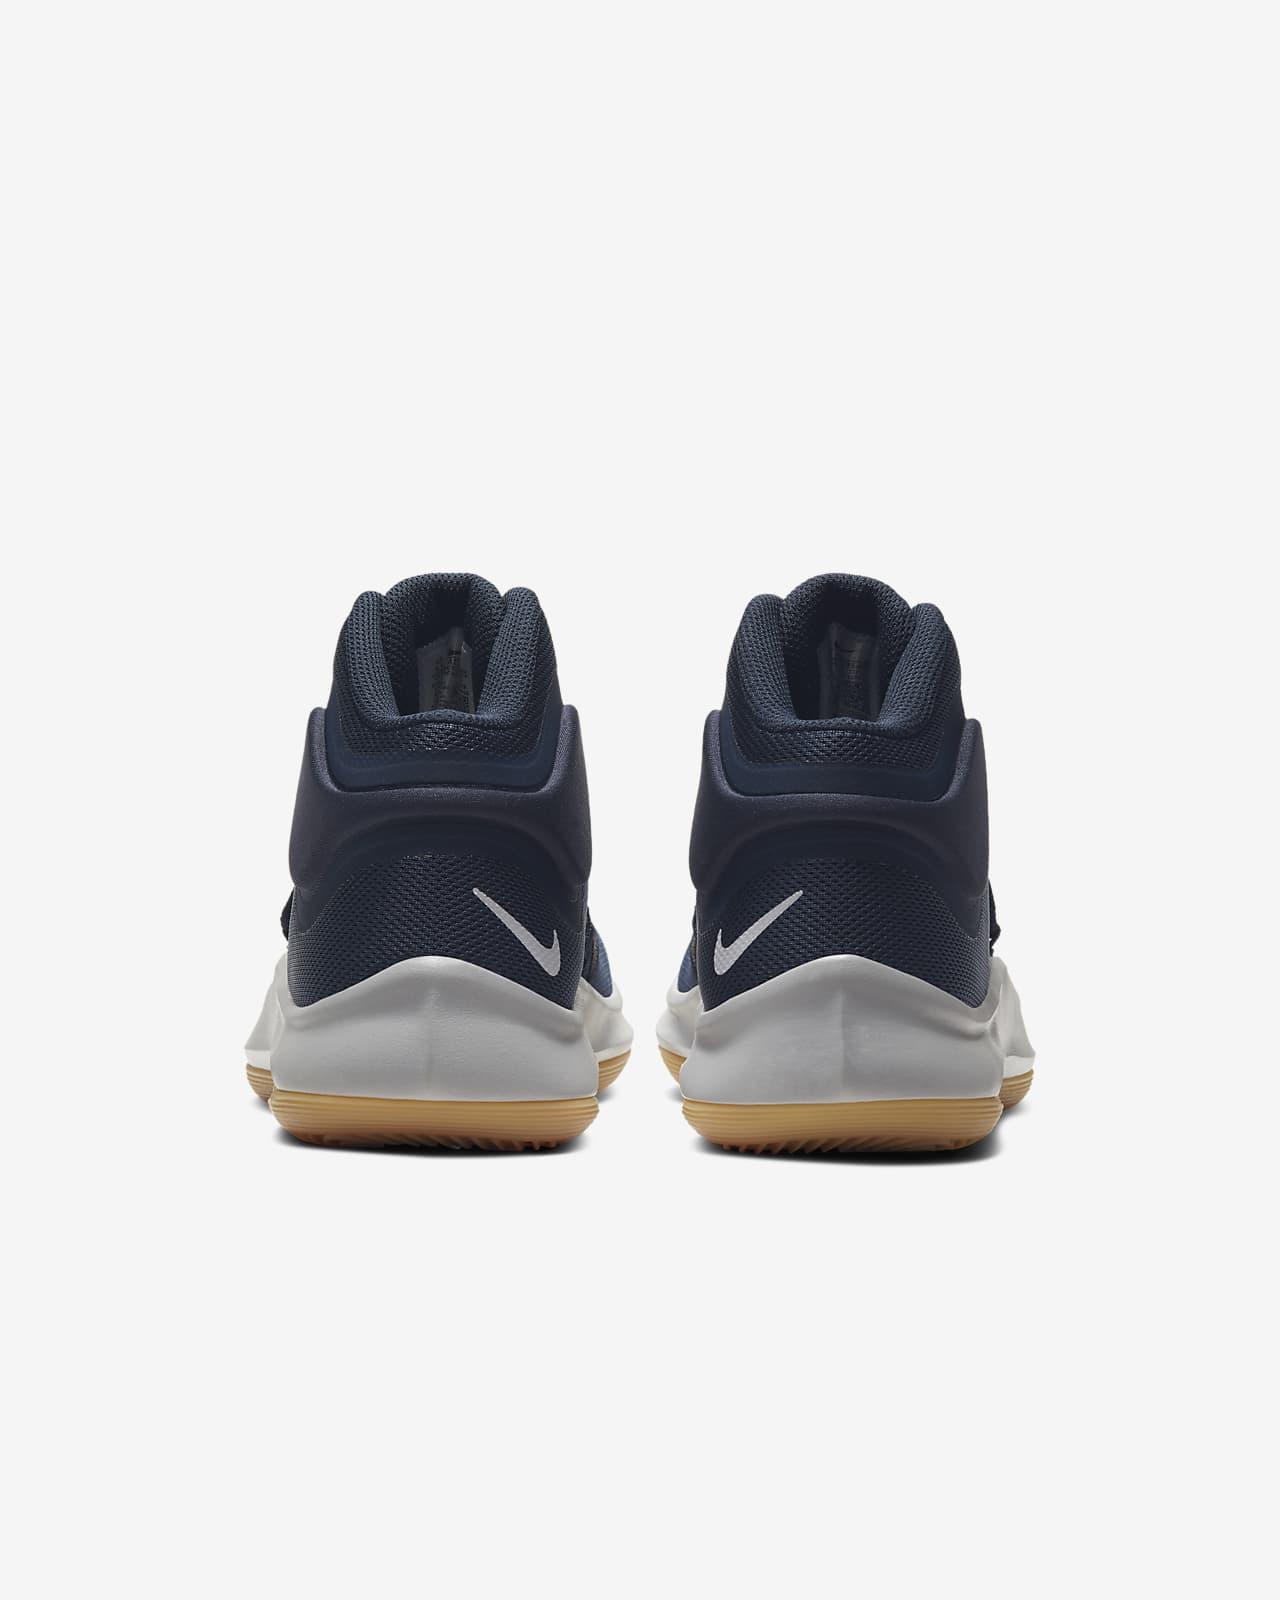 Nike Air Versitile III 籃球鞋。Nike TW